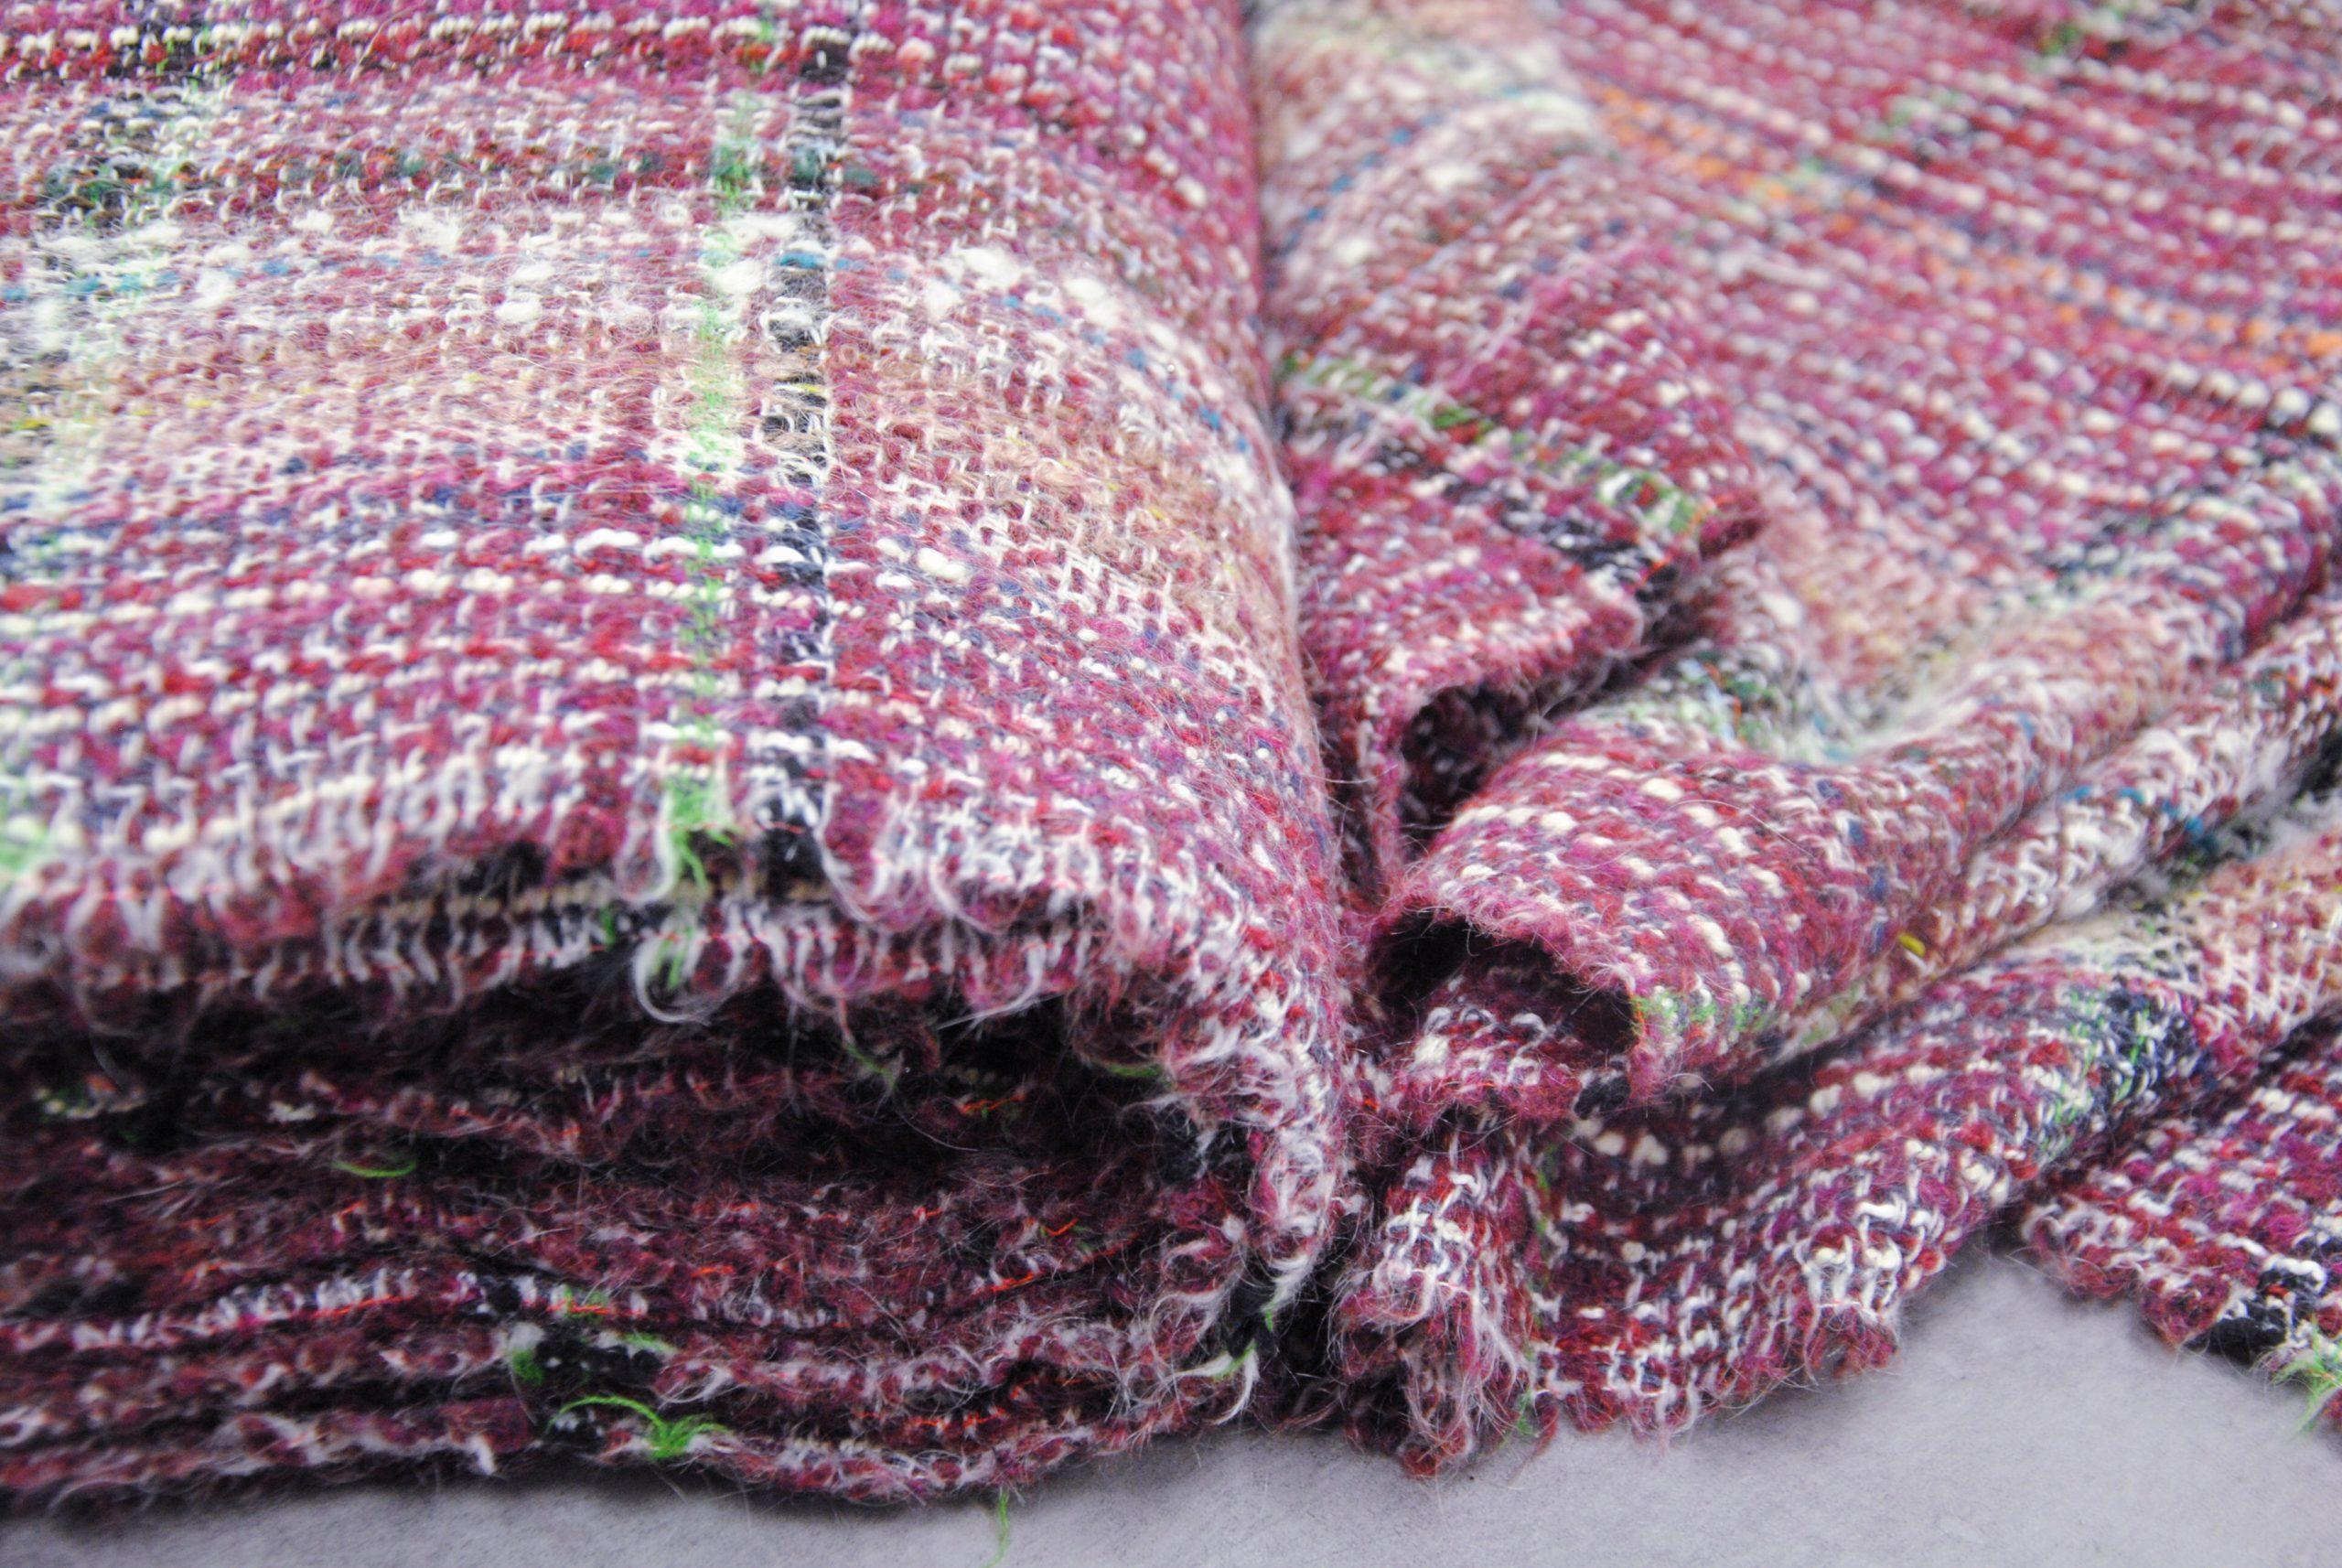 tramati 3 scaled COZY   Marsala in pura lana [caldissimo]